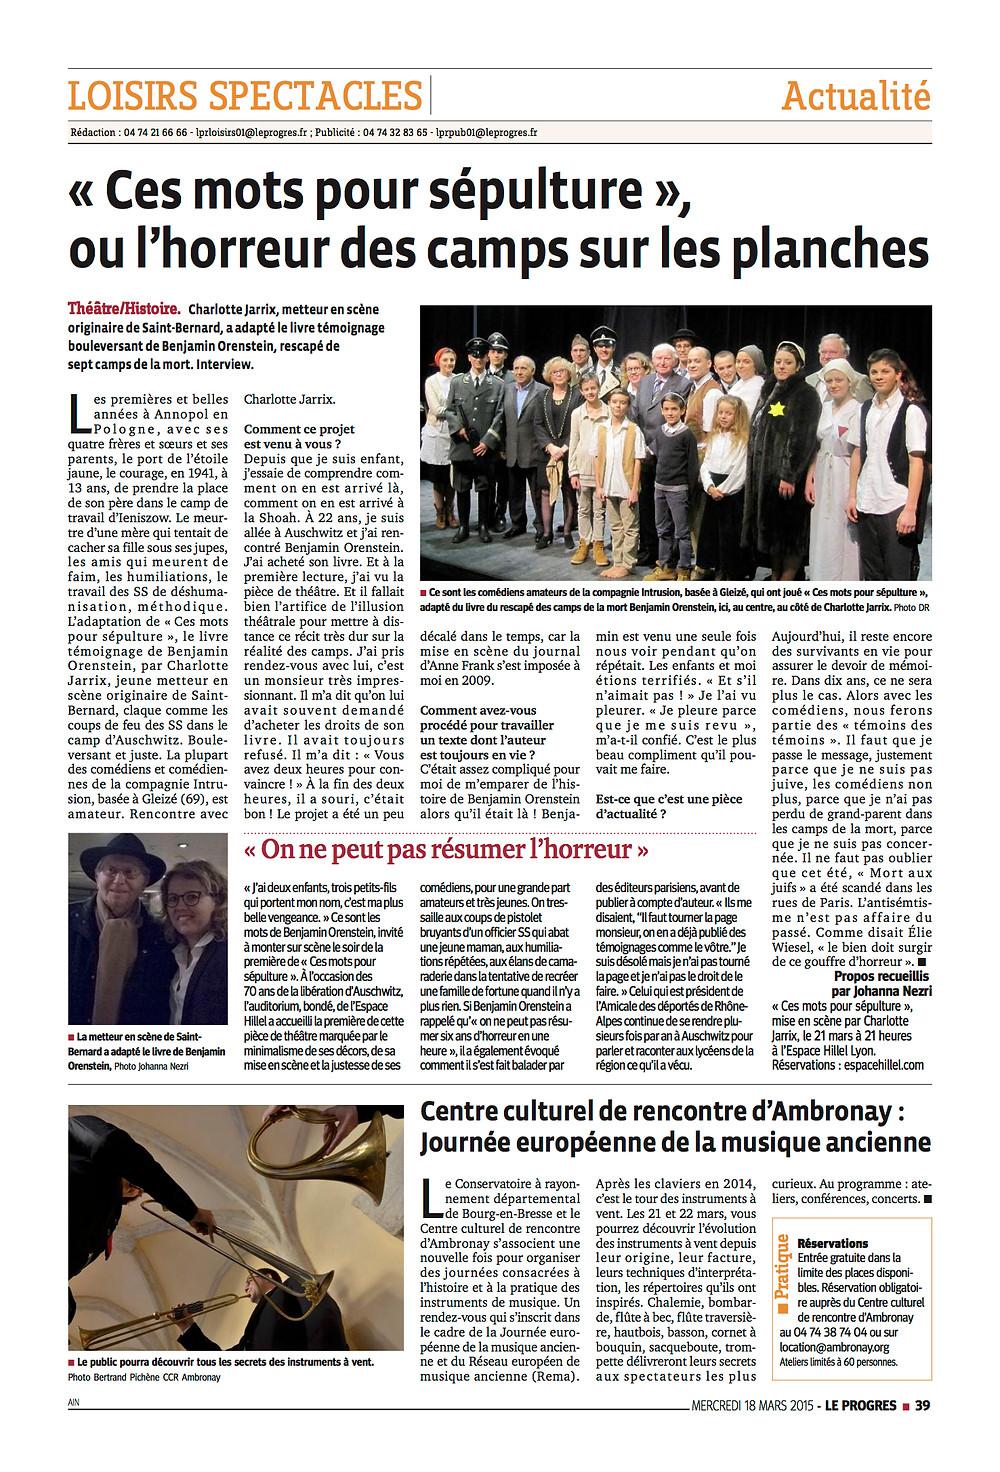 Le_Progrès,_18_mars_2015.jpg